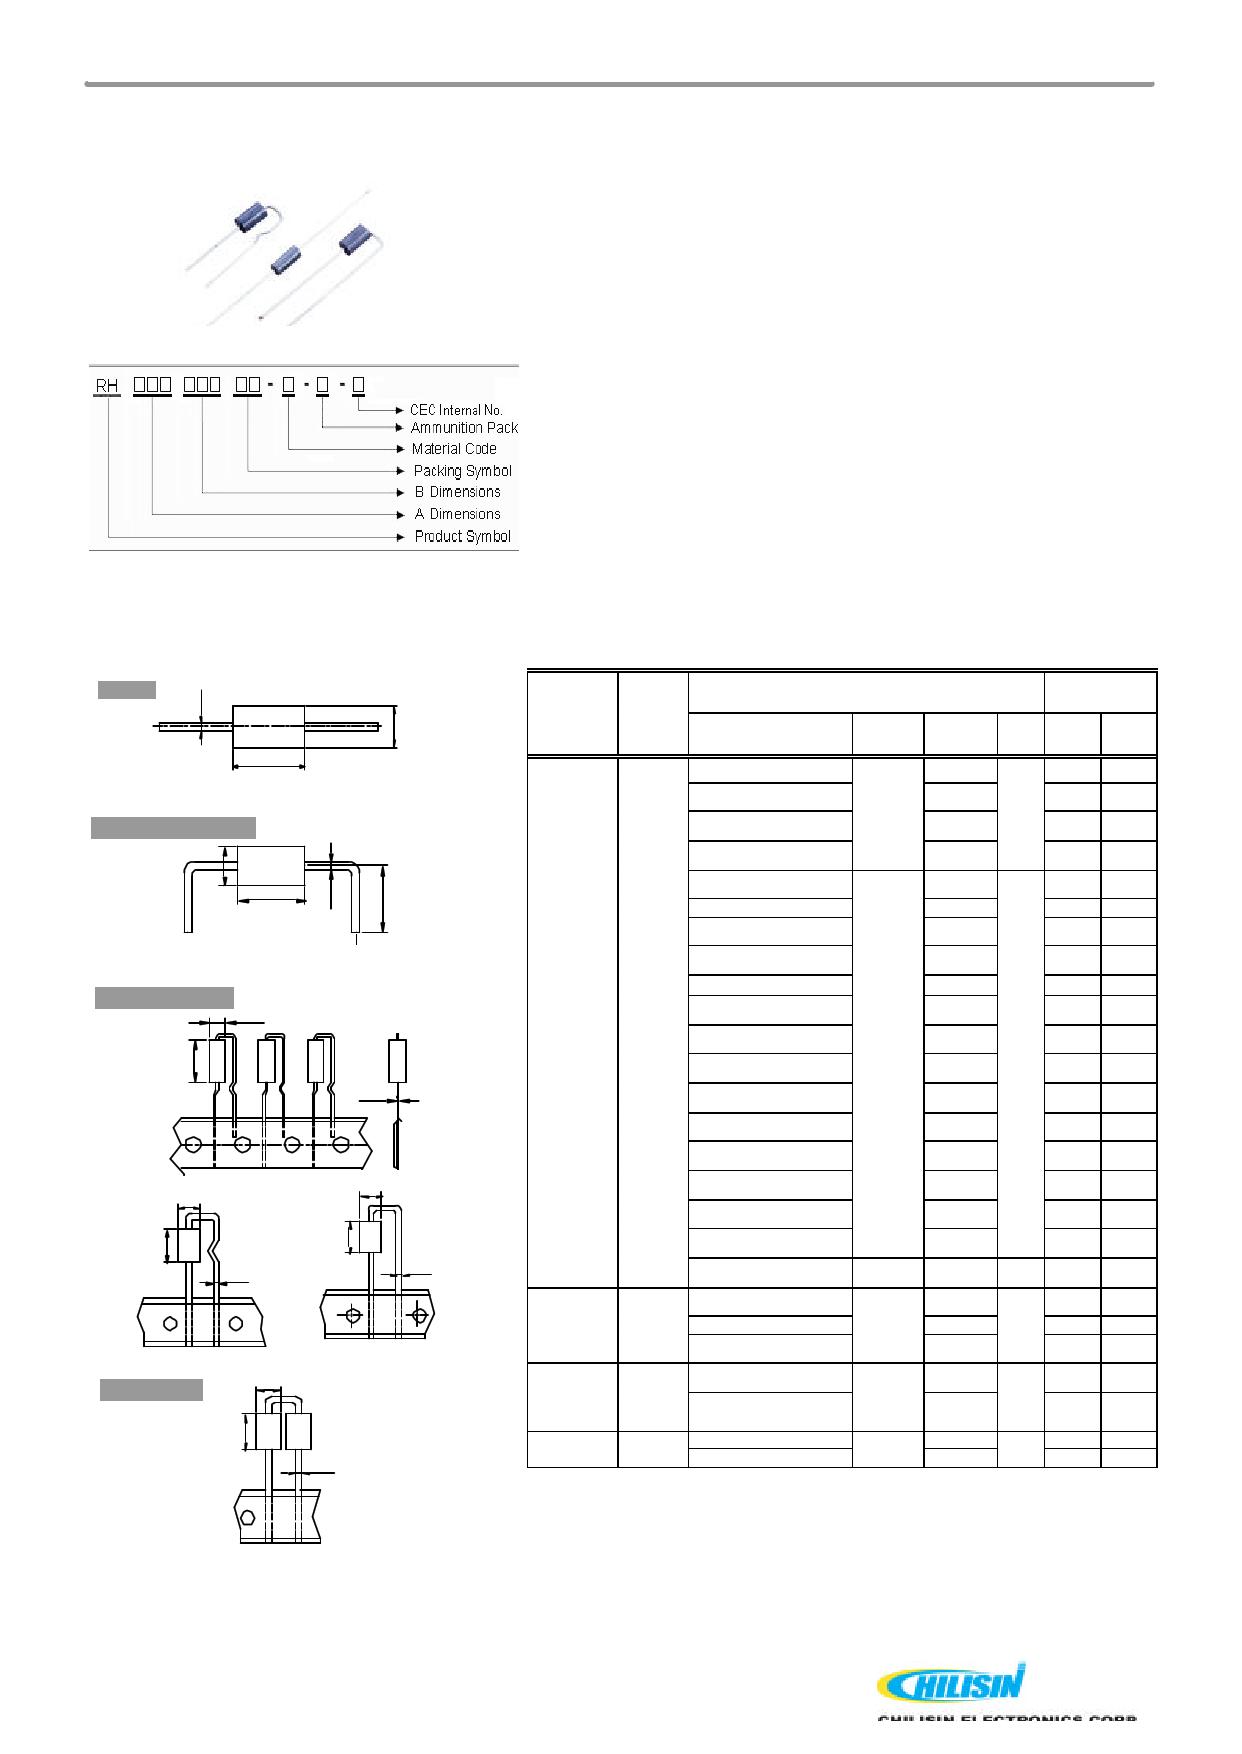 RH035078 데이터시트 및 RH035078 PDF